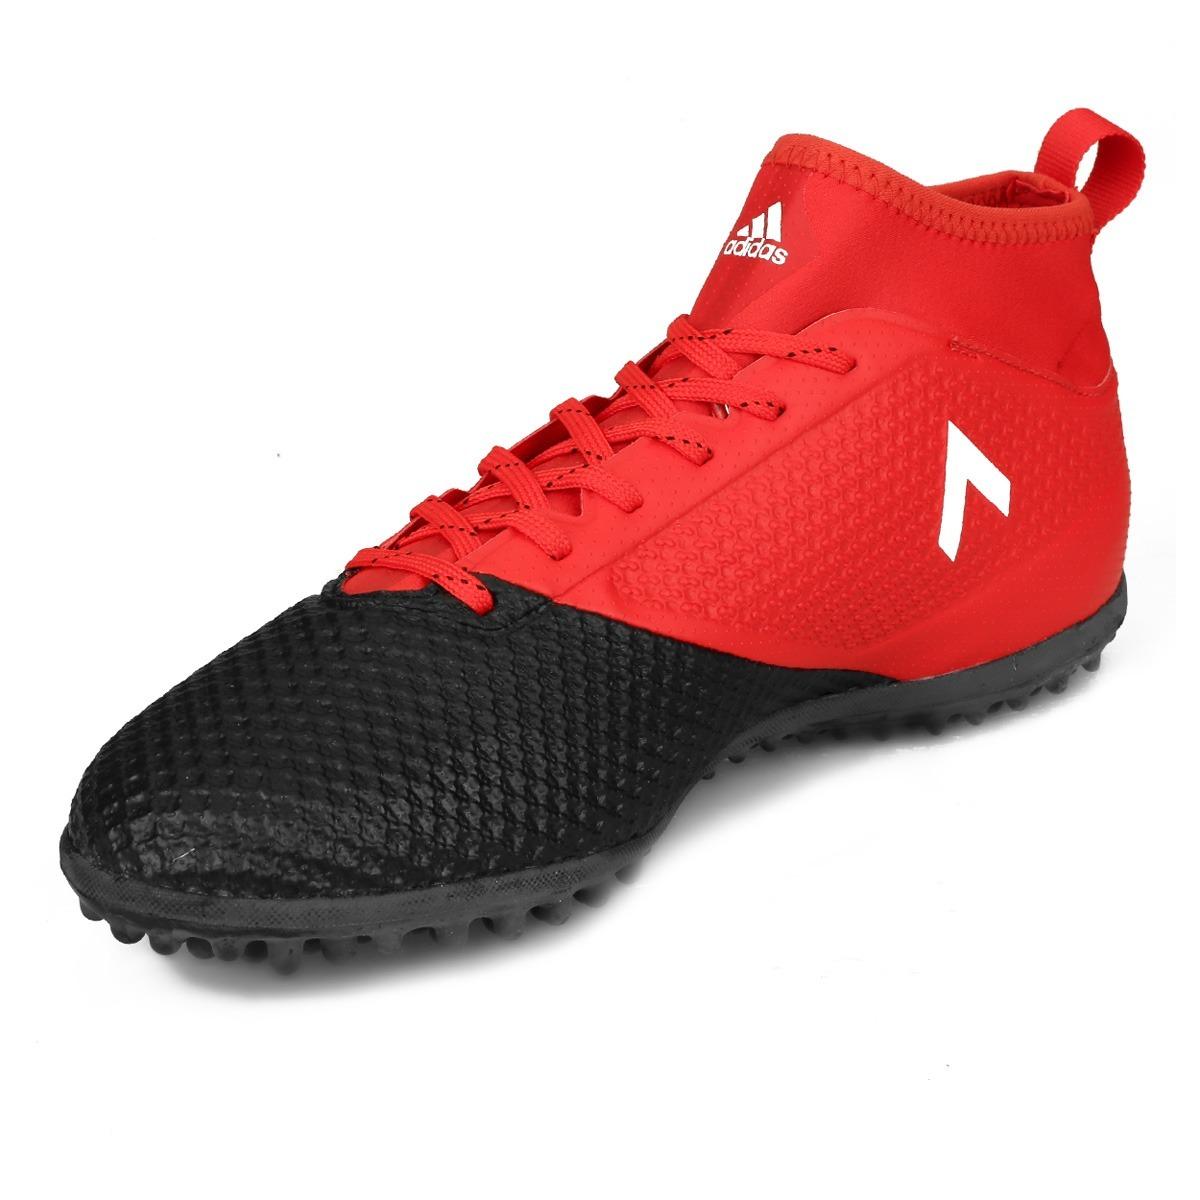 a11111208d4d5 Botines Botitas adidas Ace 17.3papi Futbol Talle 41 1 2 -   2.099